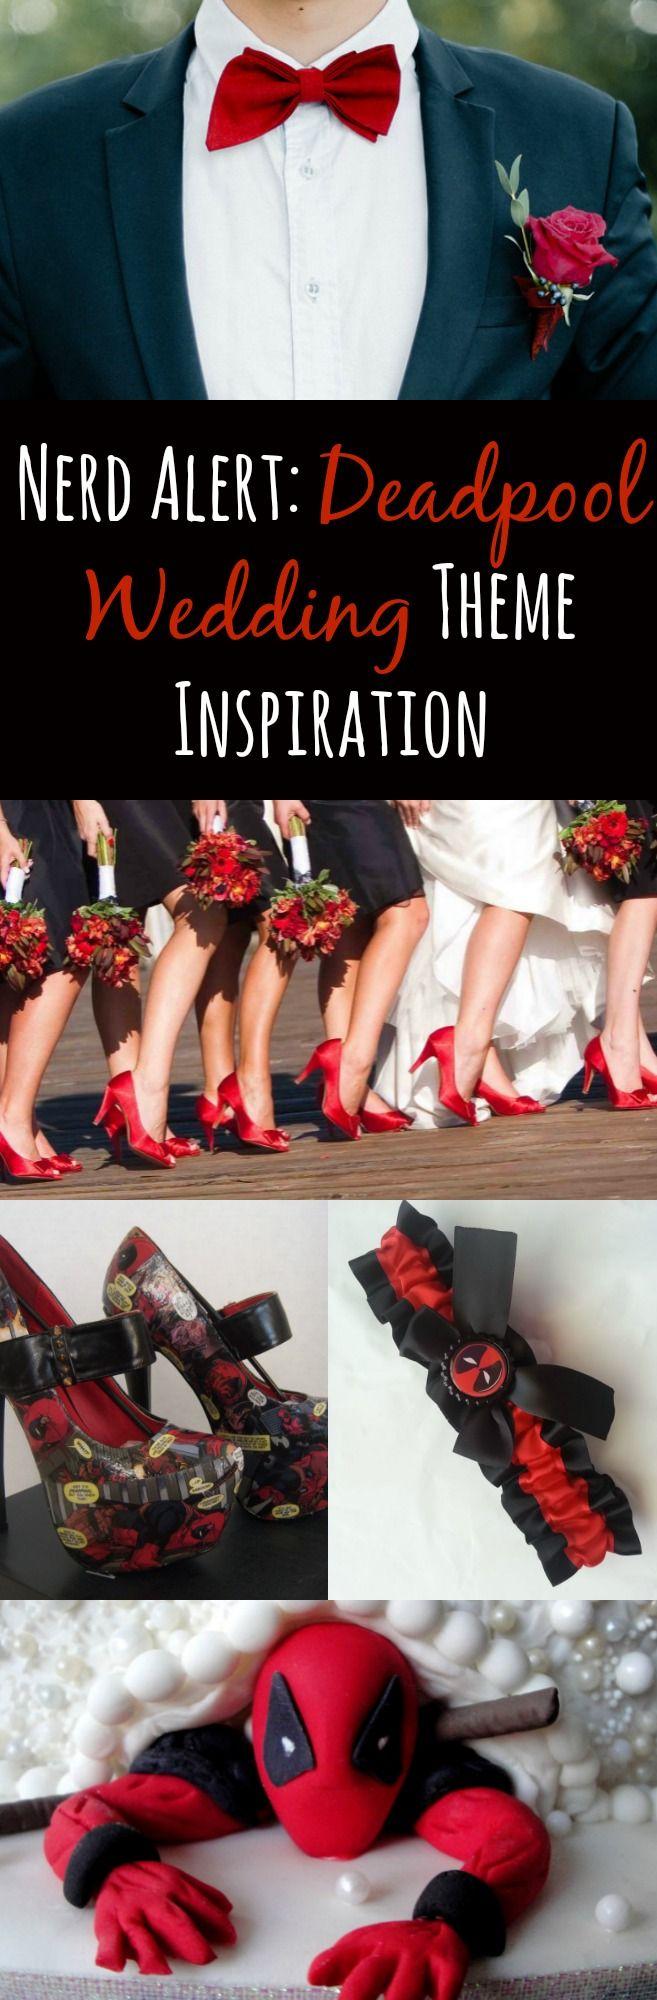 Nerd Alert: Deadpool Wedding Theme Inspiration | Unique & Fun Wedding Ideas for Cool Couples!